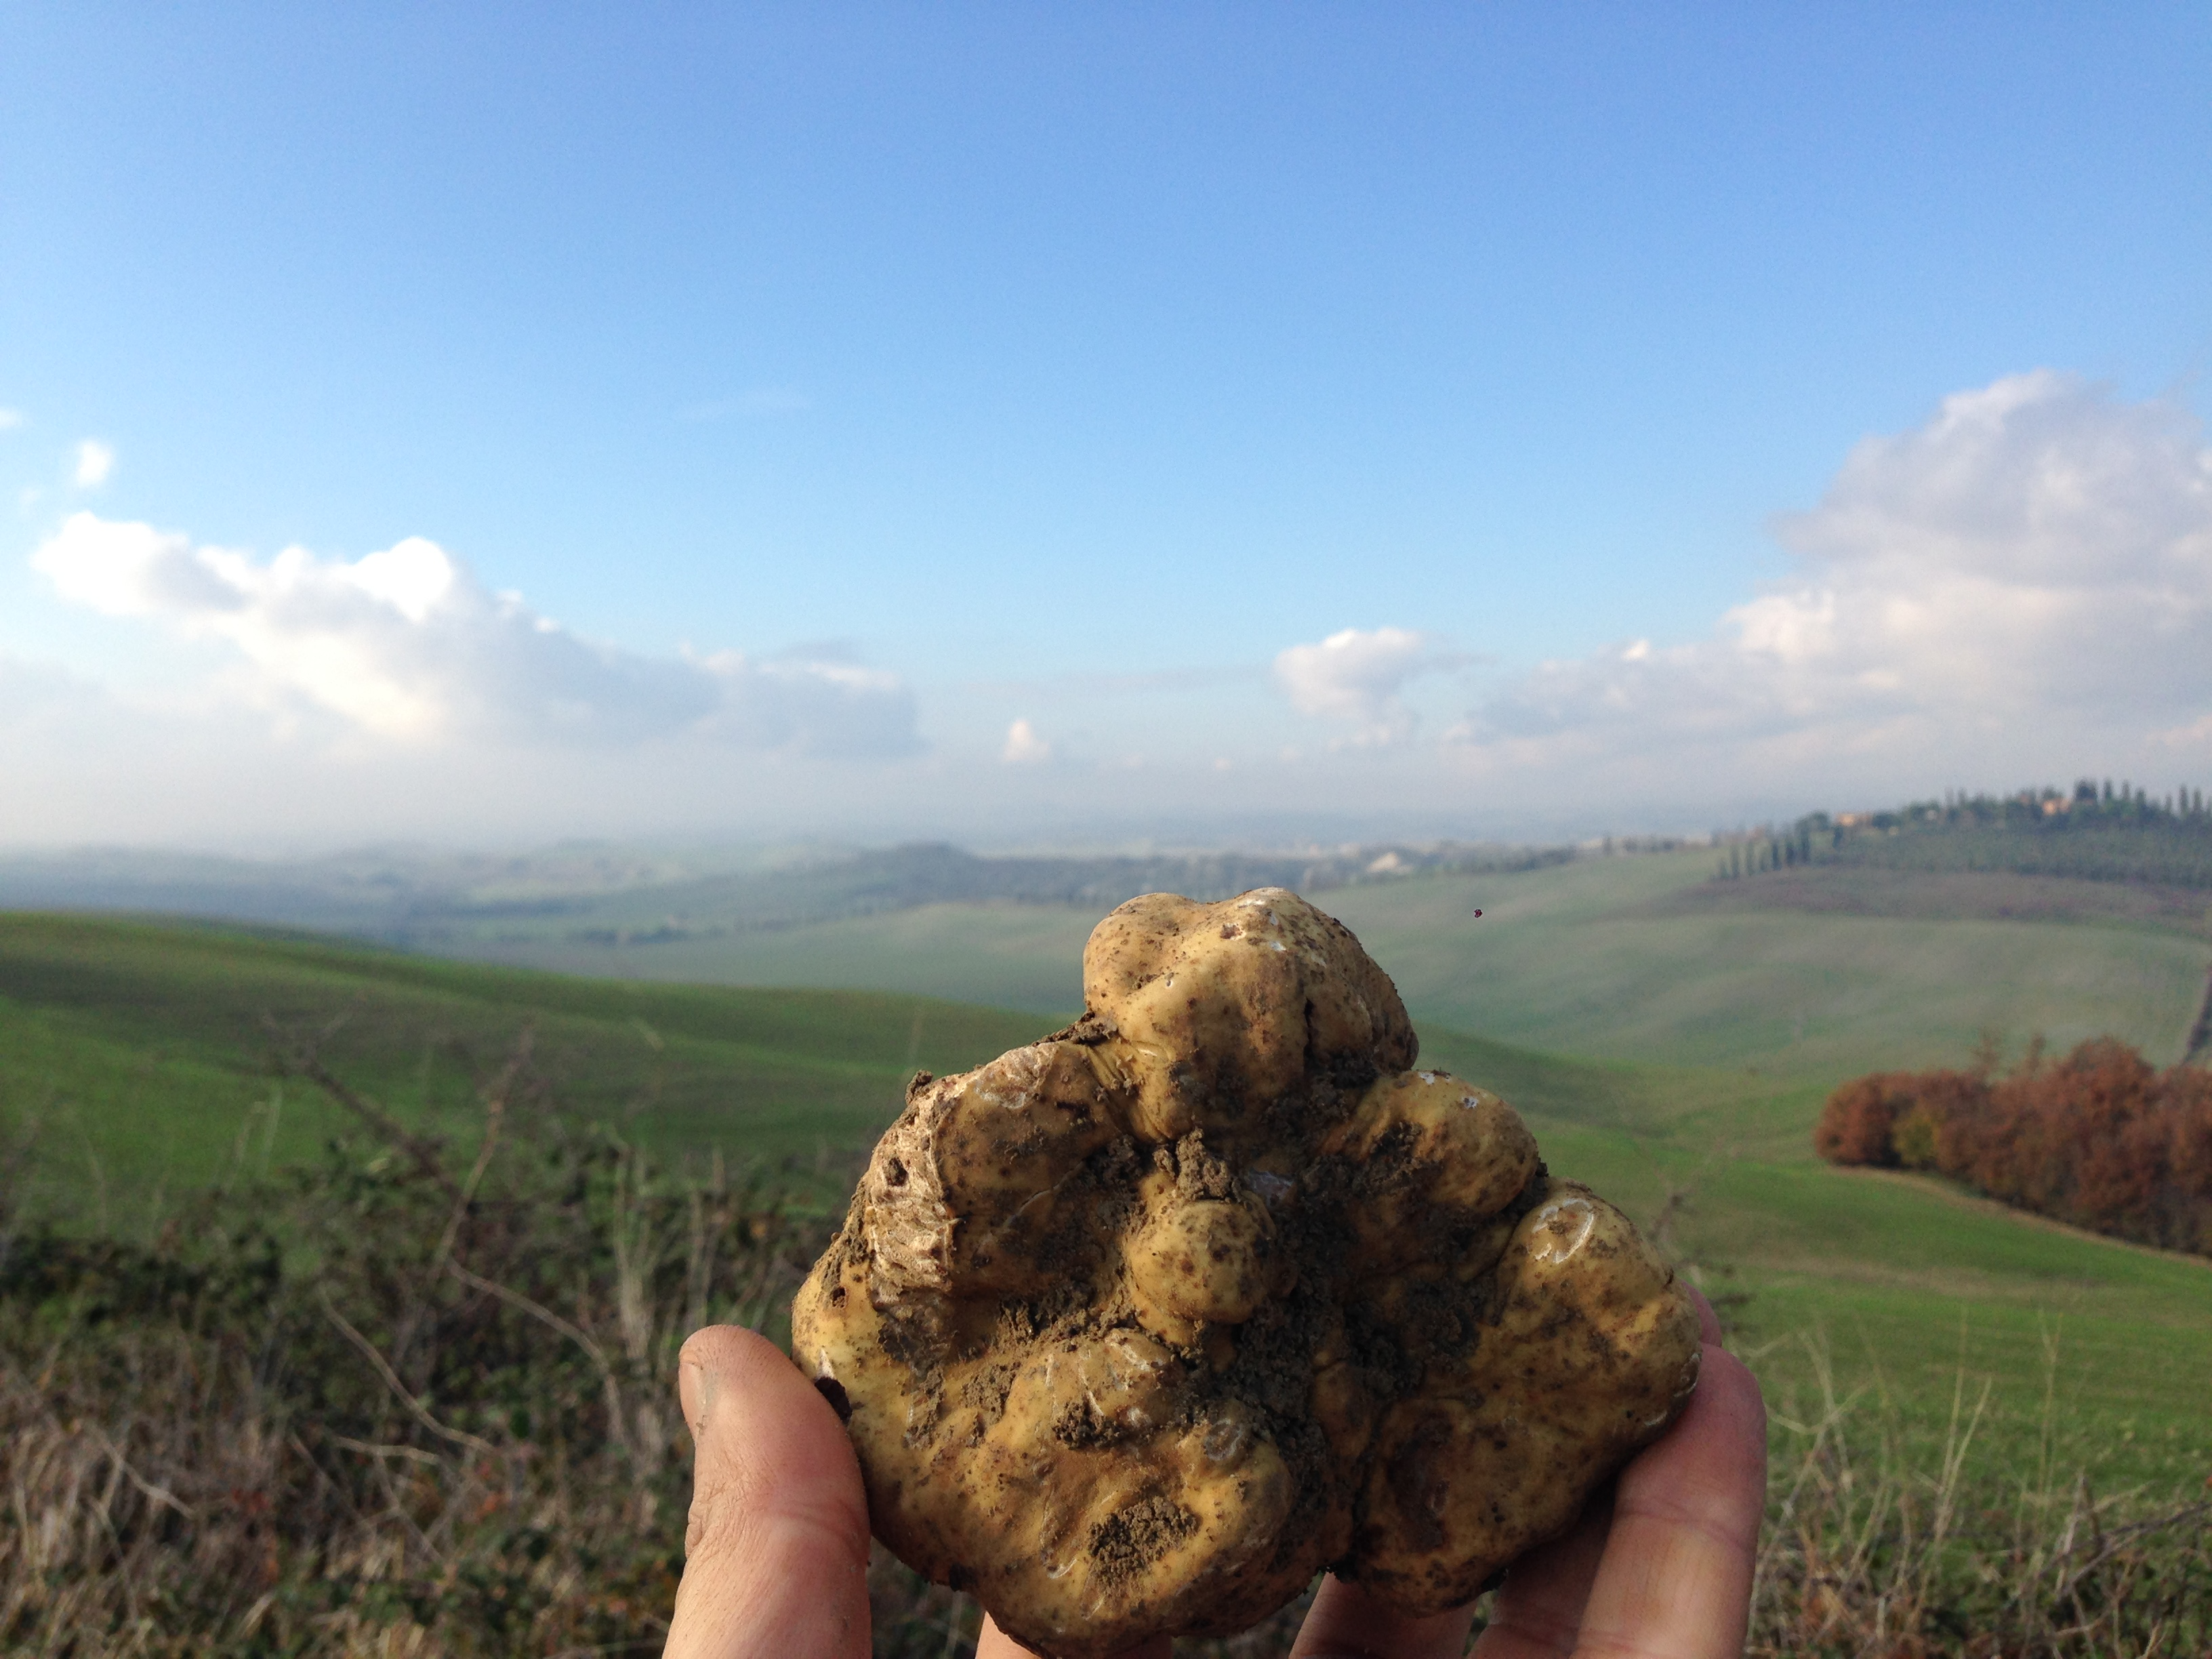 Un bellissimo tartufo bianco trovato nelle colline di Siena - trifola Siena Tartufi, Toscana